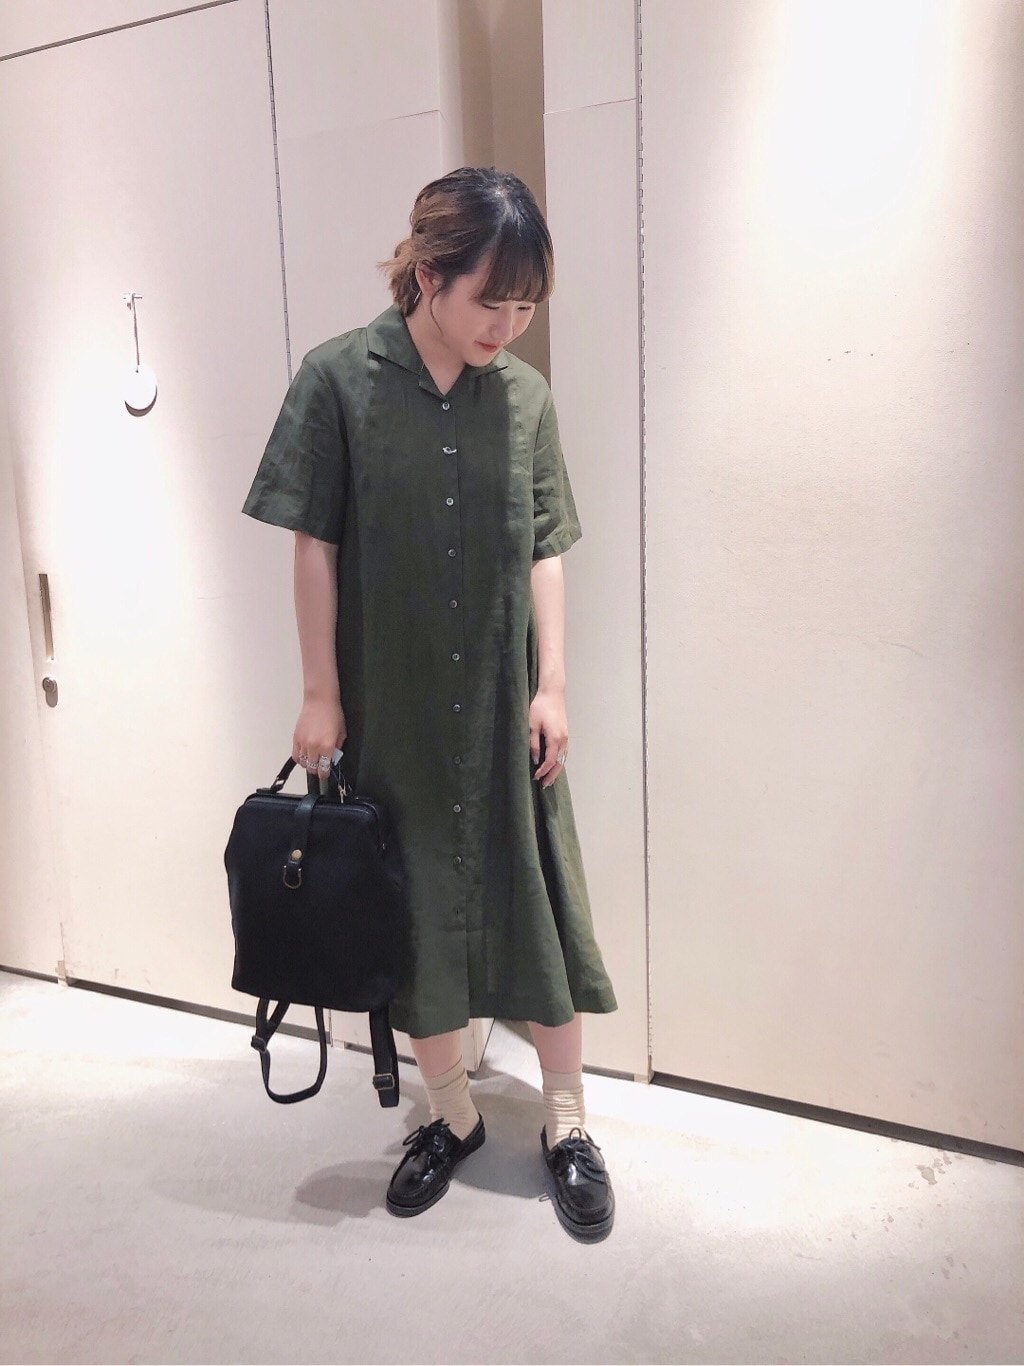 bulle de savon 阪急西宮ガーデンズ 身長:167cm 2019.07.10